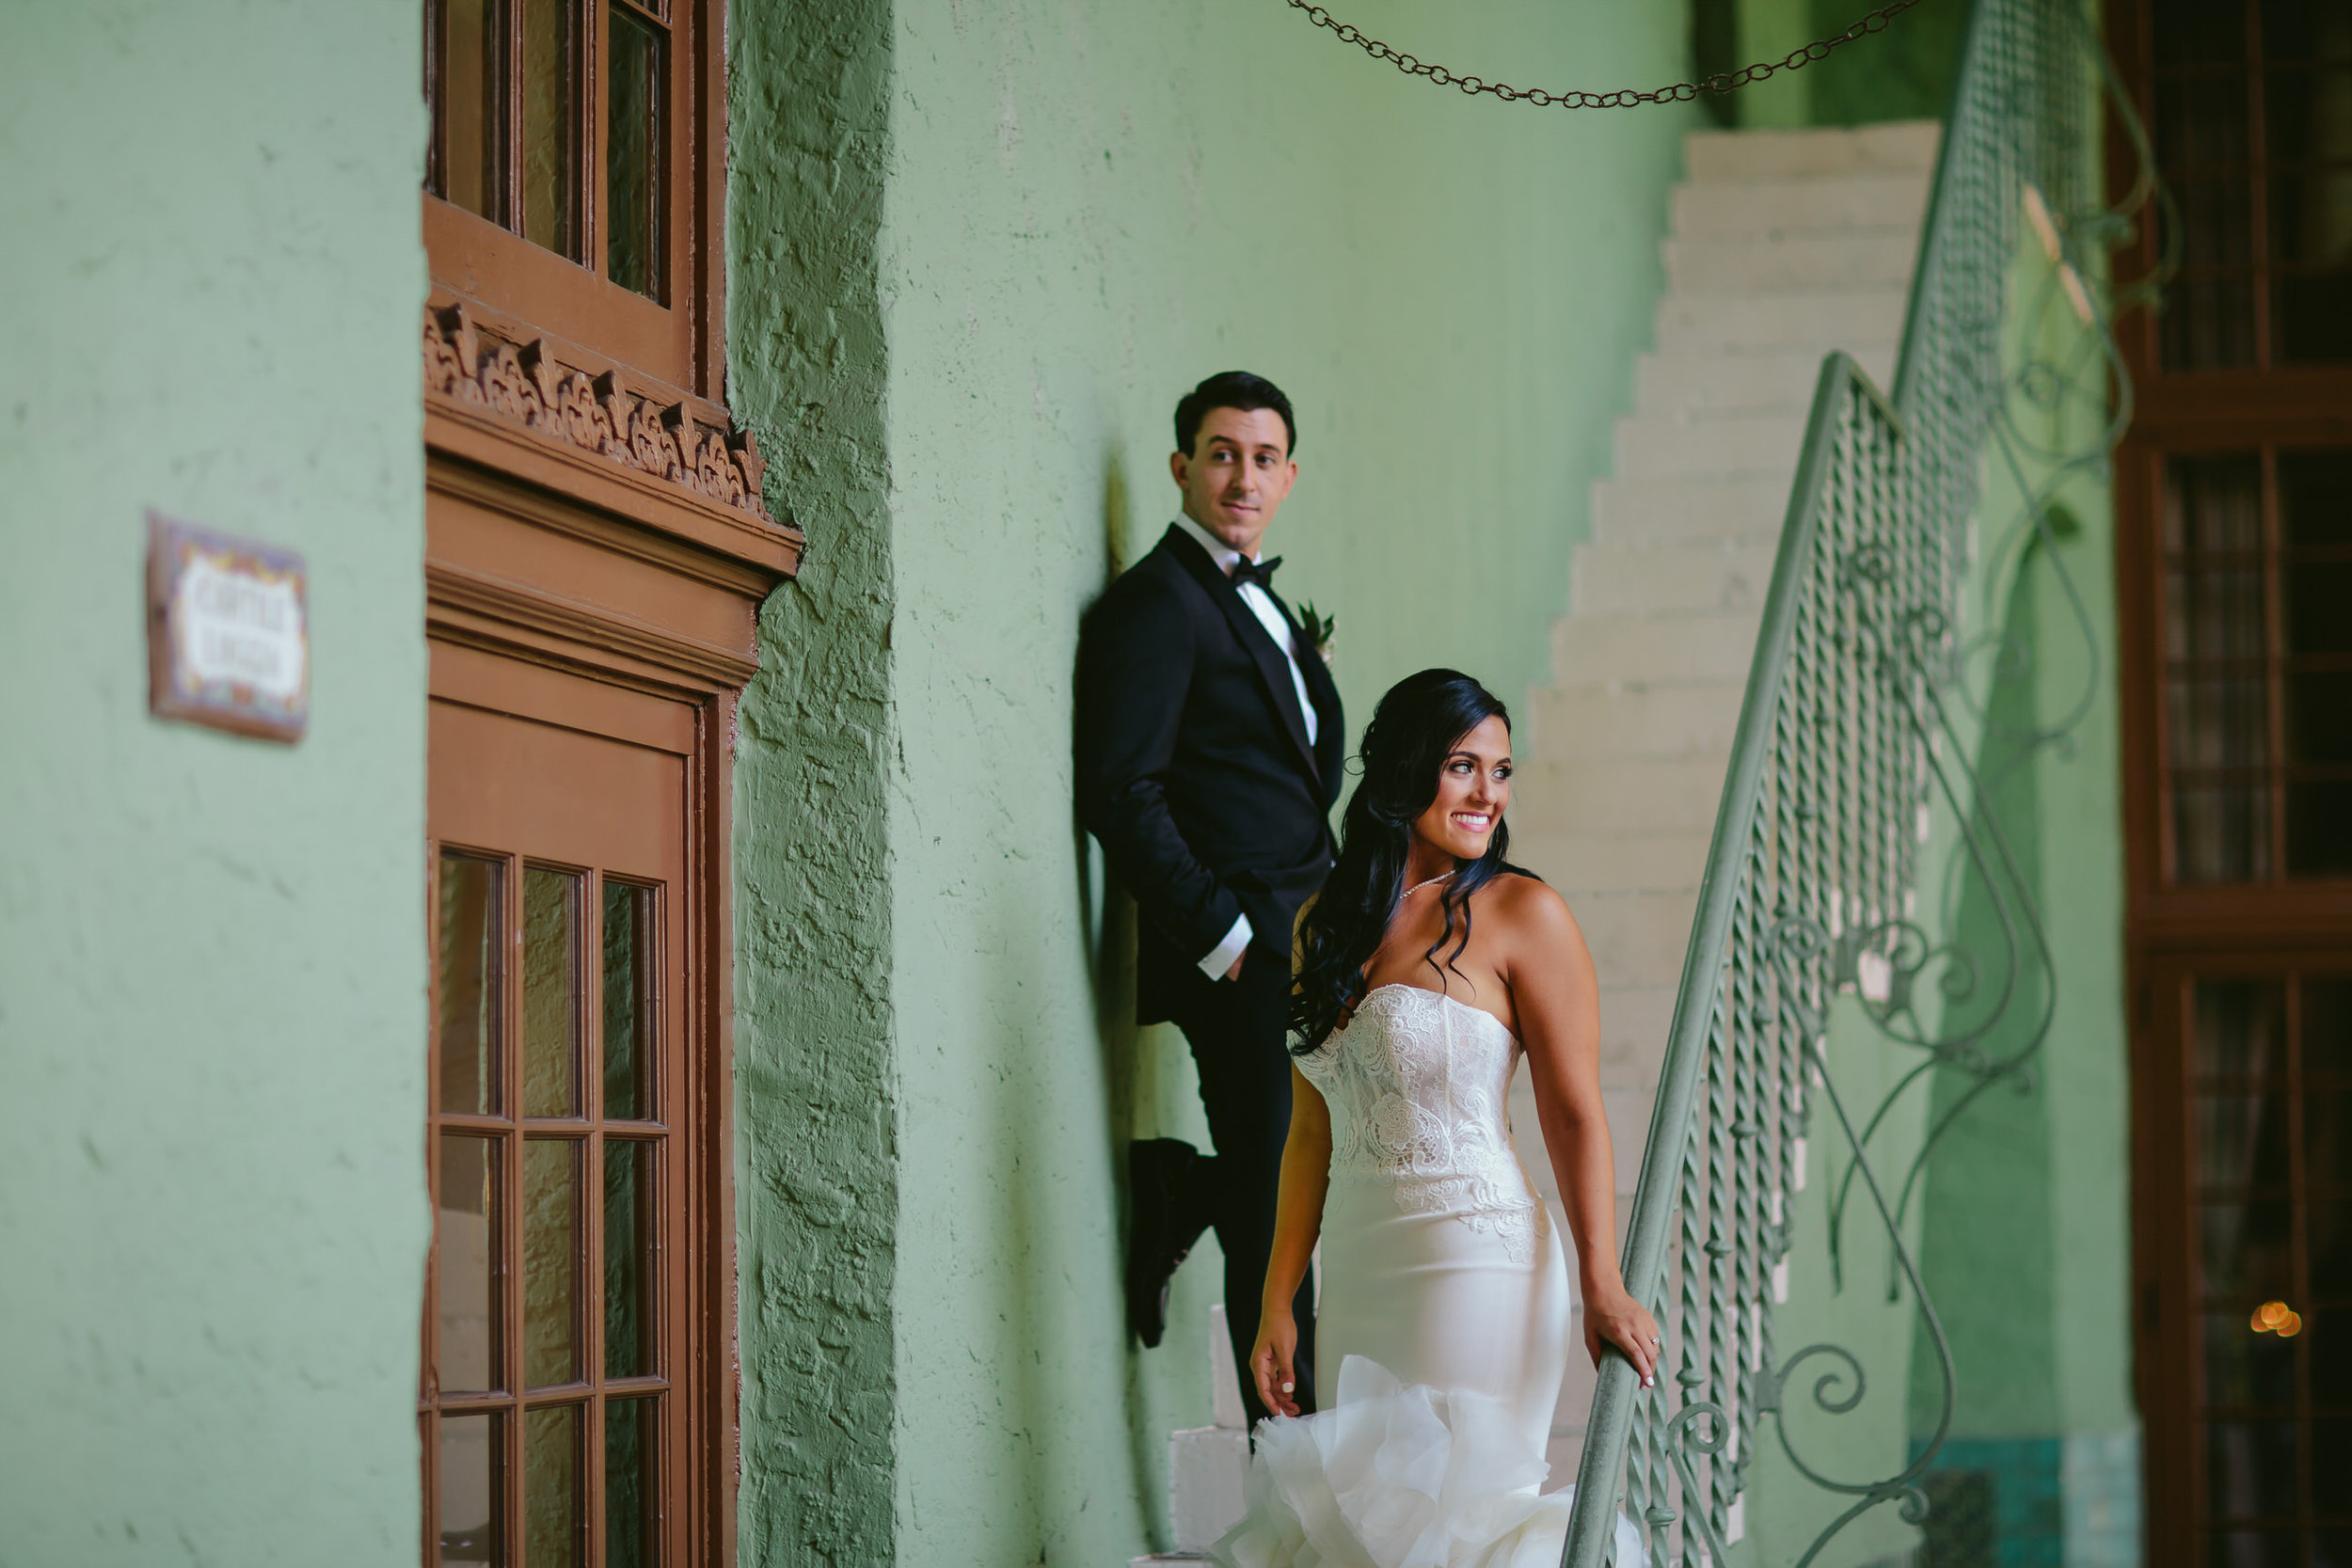 biltmore-wedding-steph-lynn-photo-photographer-bride-and-groom-17.jpg